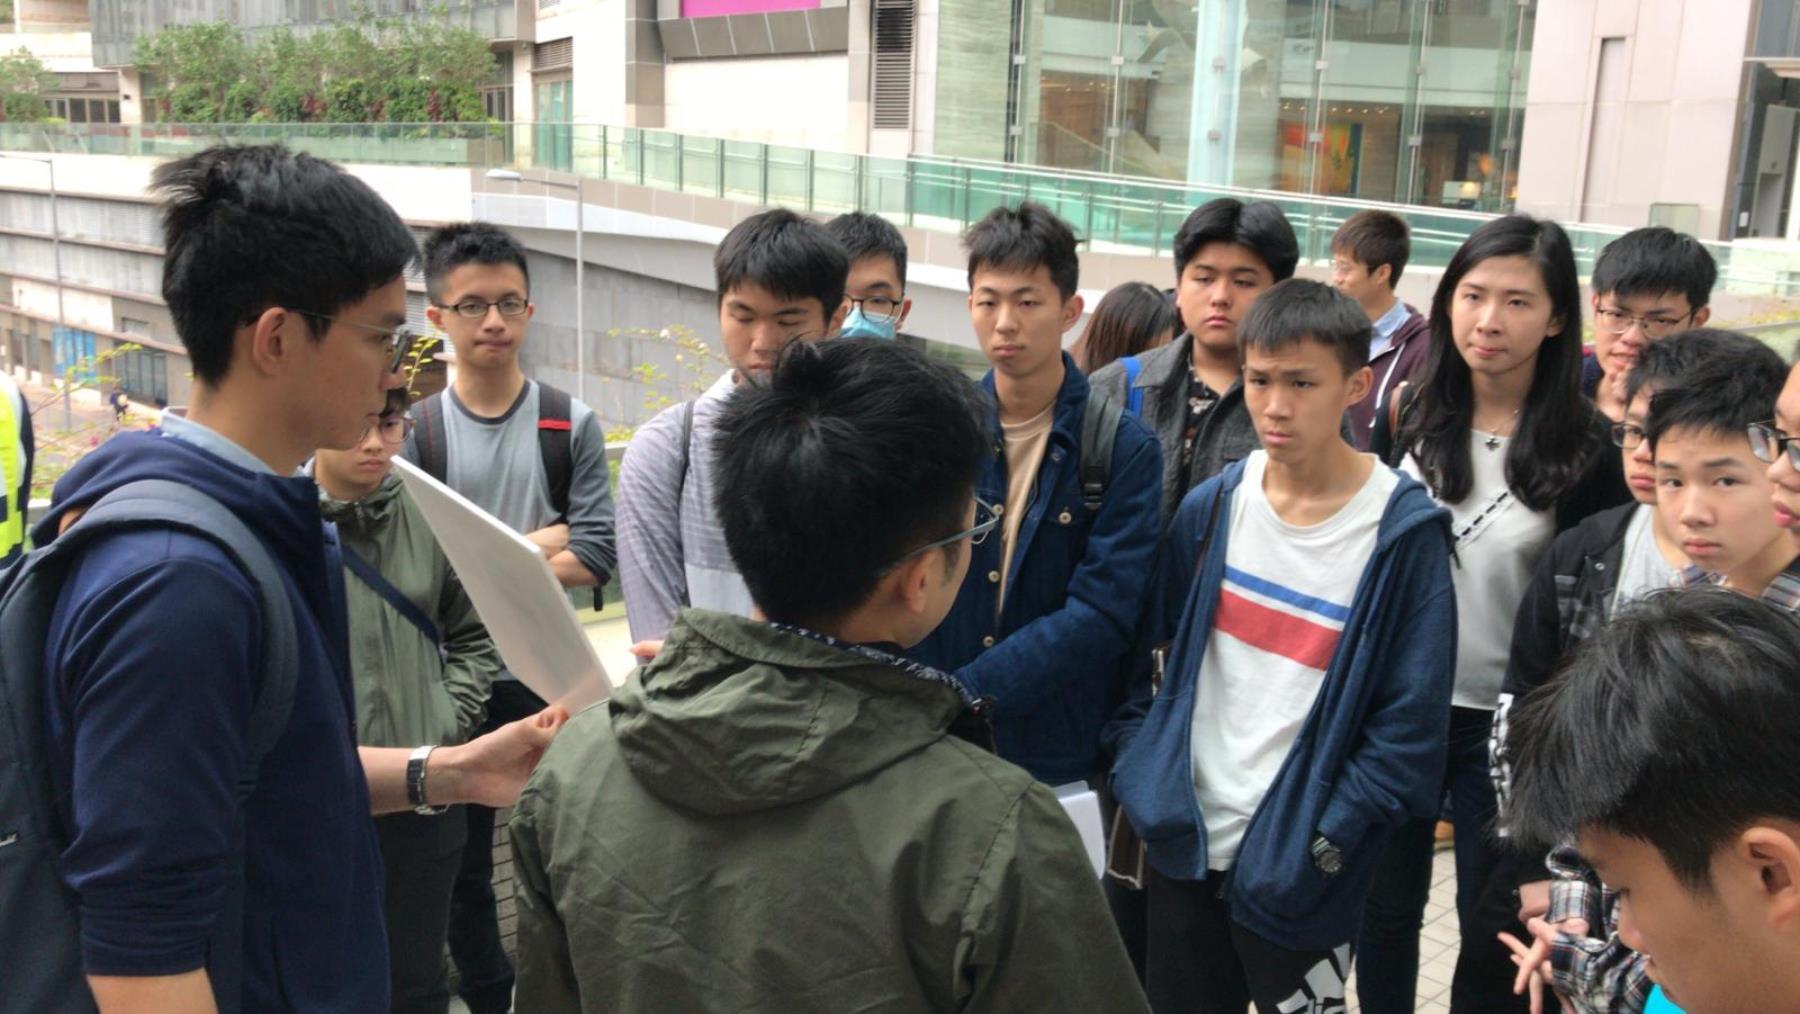 http://npc.edu.hk/sites/default/files/img-20190223-wa0030.jpg